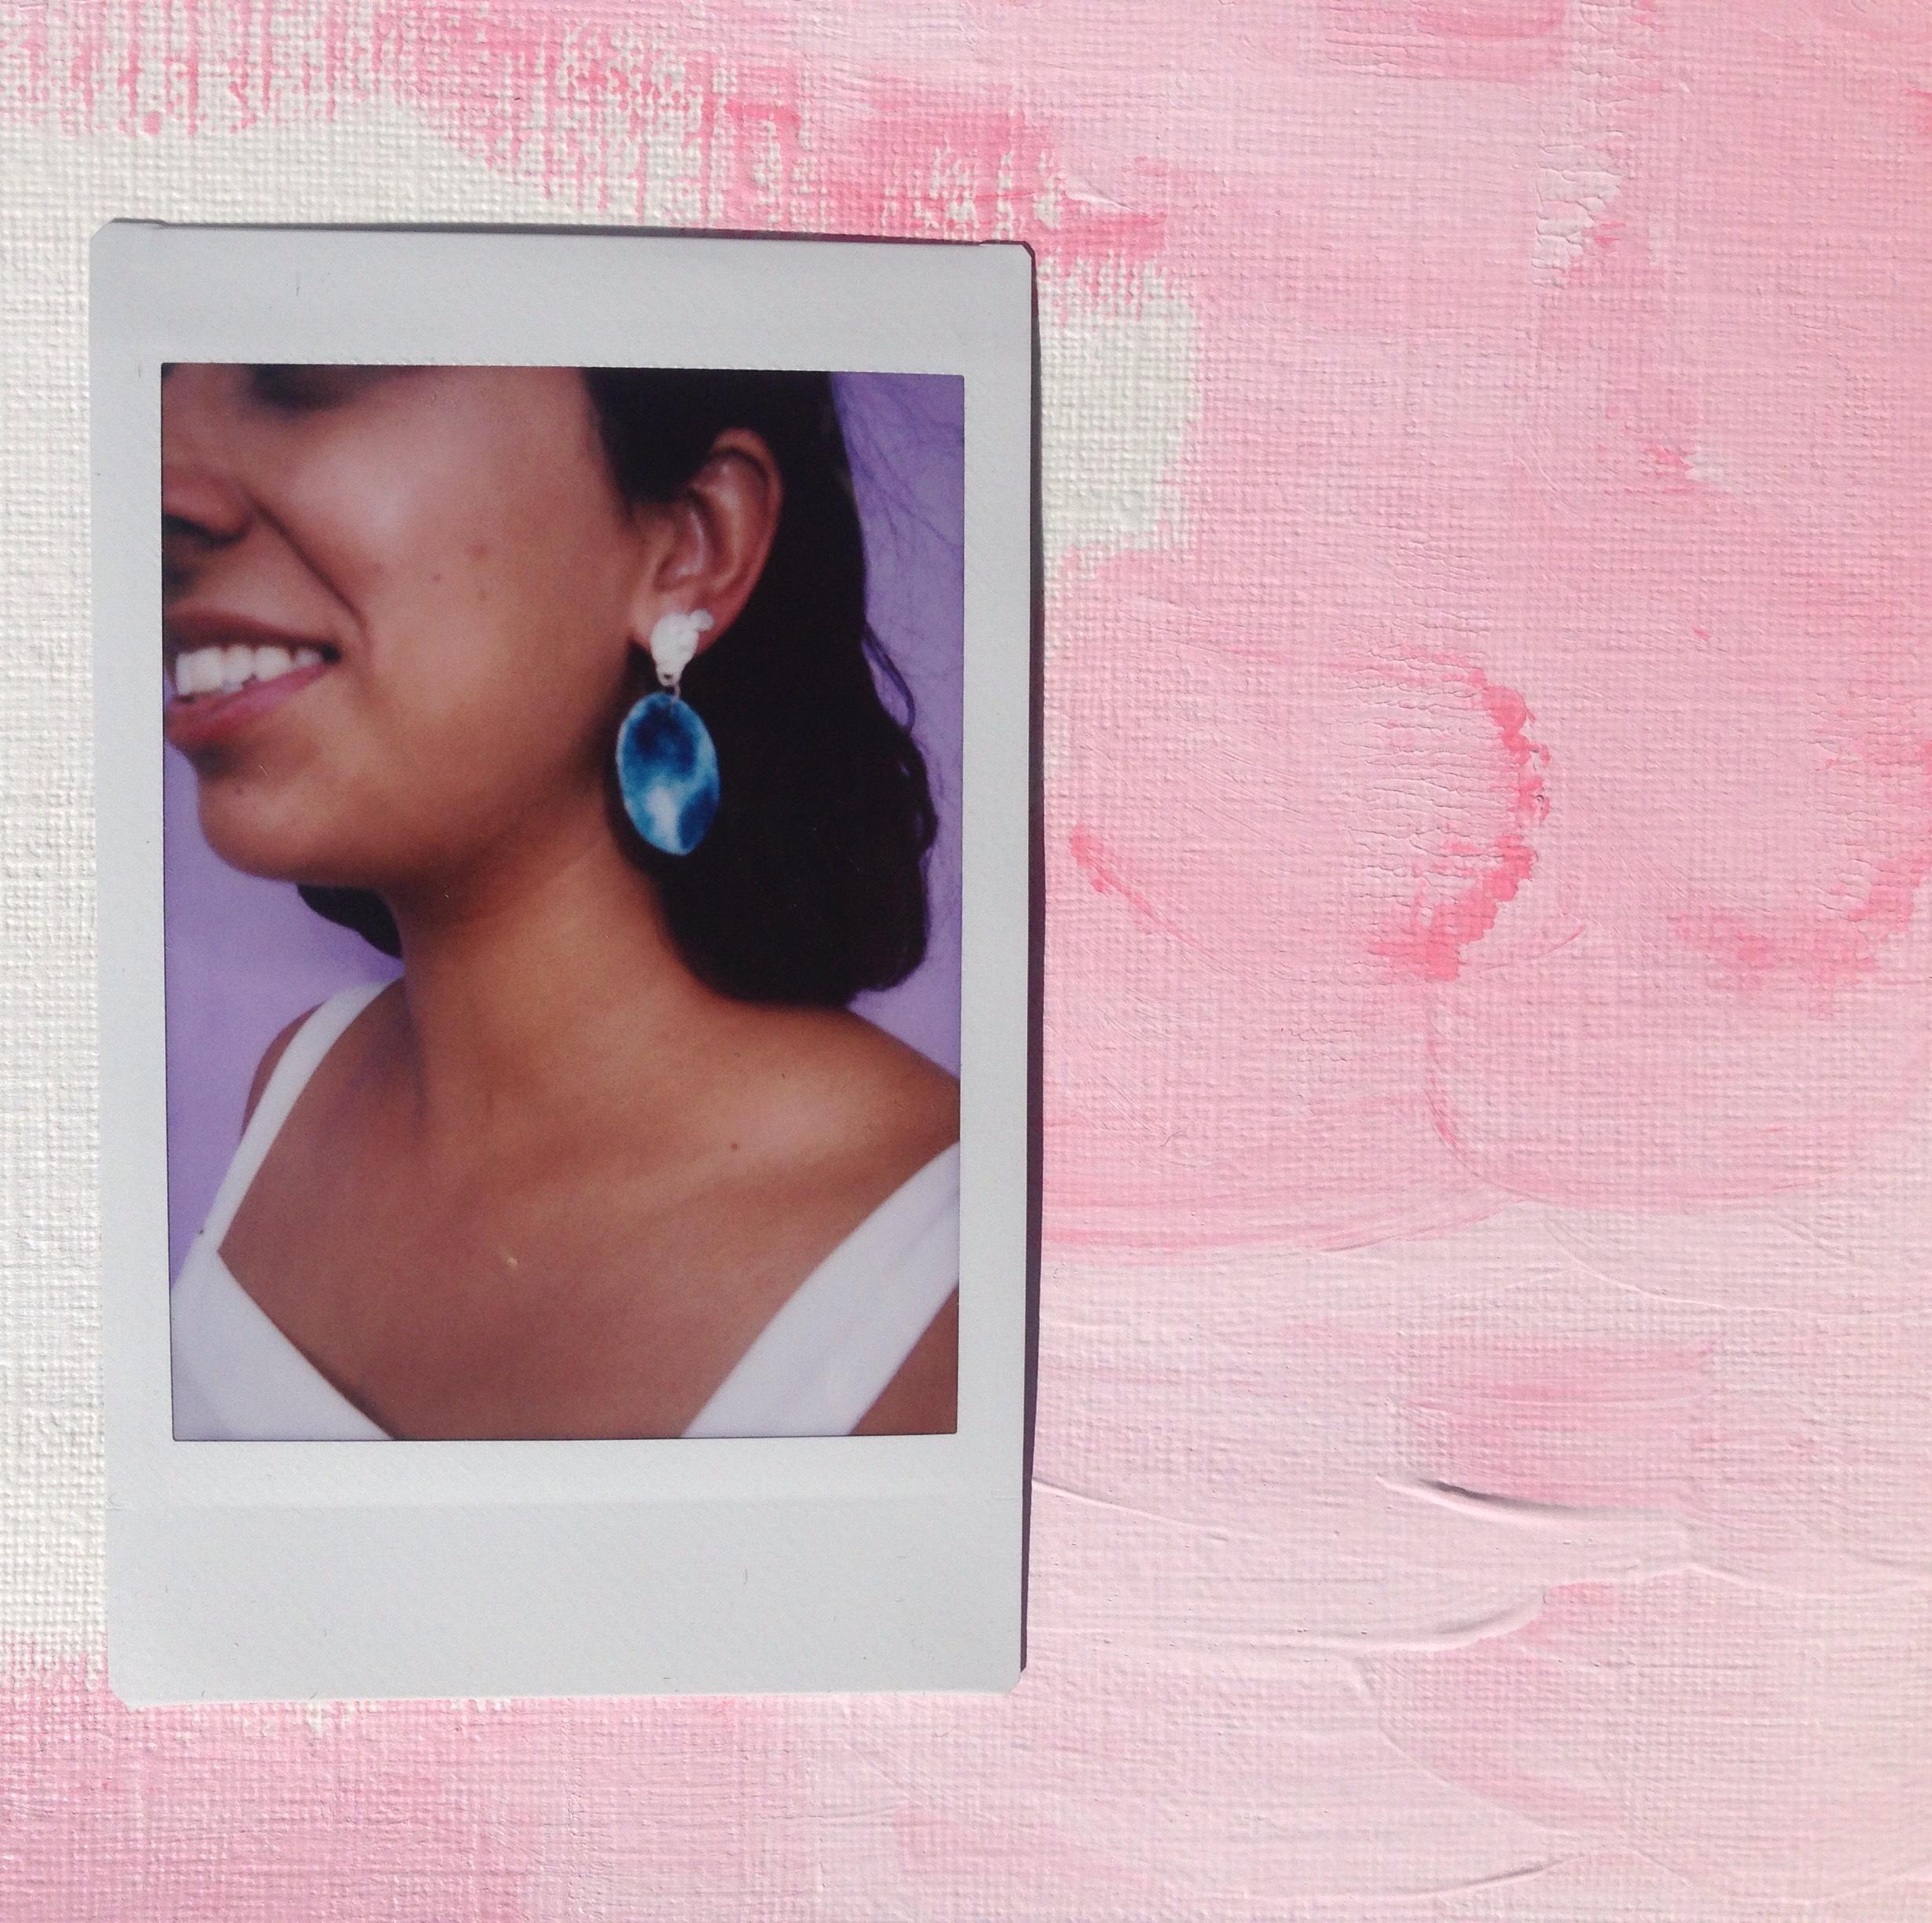 ada-hodgson-contemporary-australian-jewellery-designer-jeweller-design-handmade-mebourne-custom-engagement-wedding-enamel-sterling-jewelry-statement-ring-earrings-handcrafted-unique-bespoke